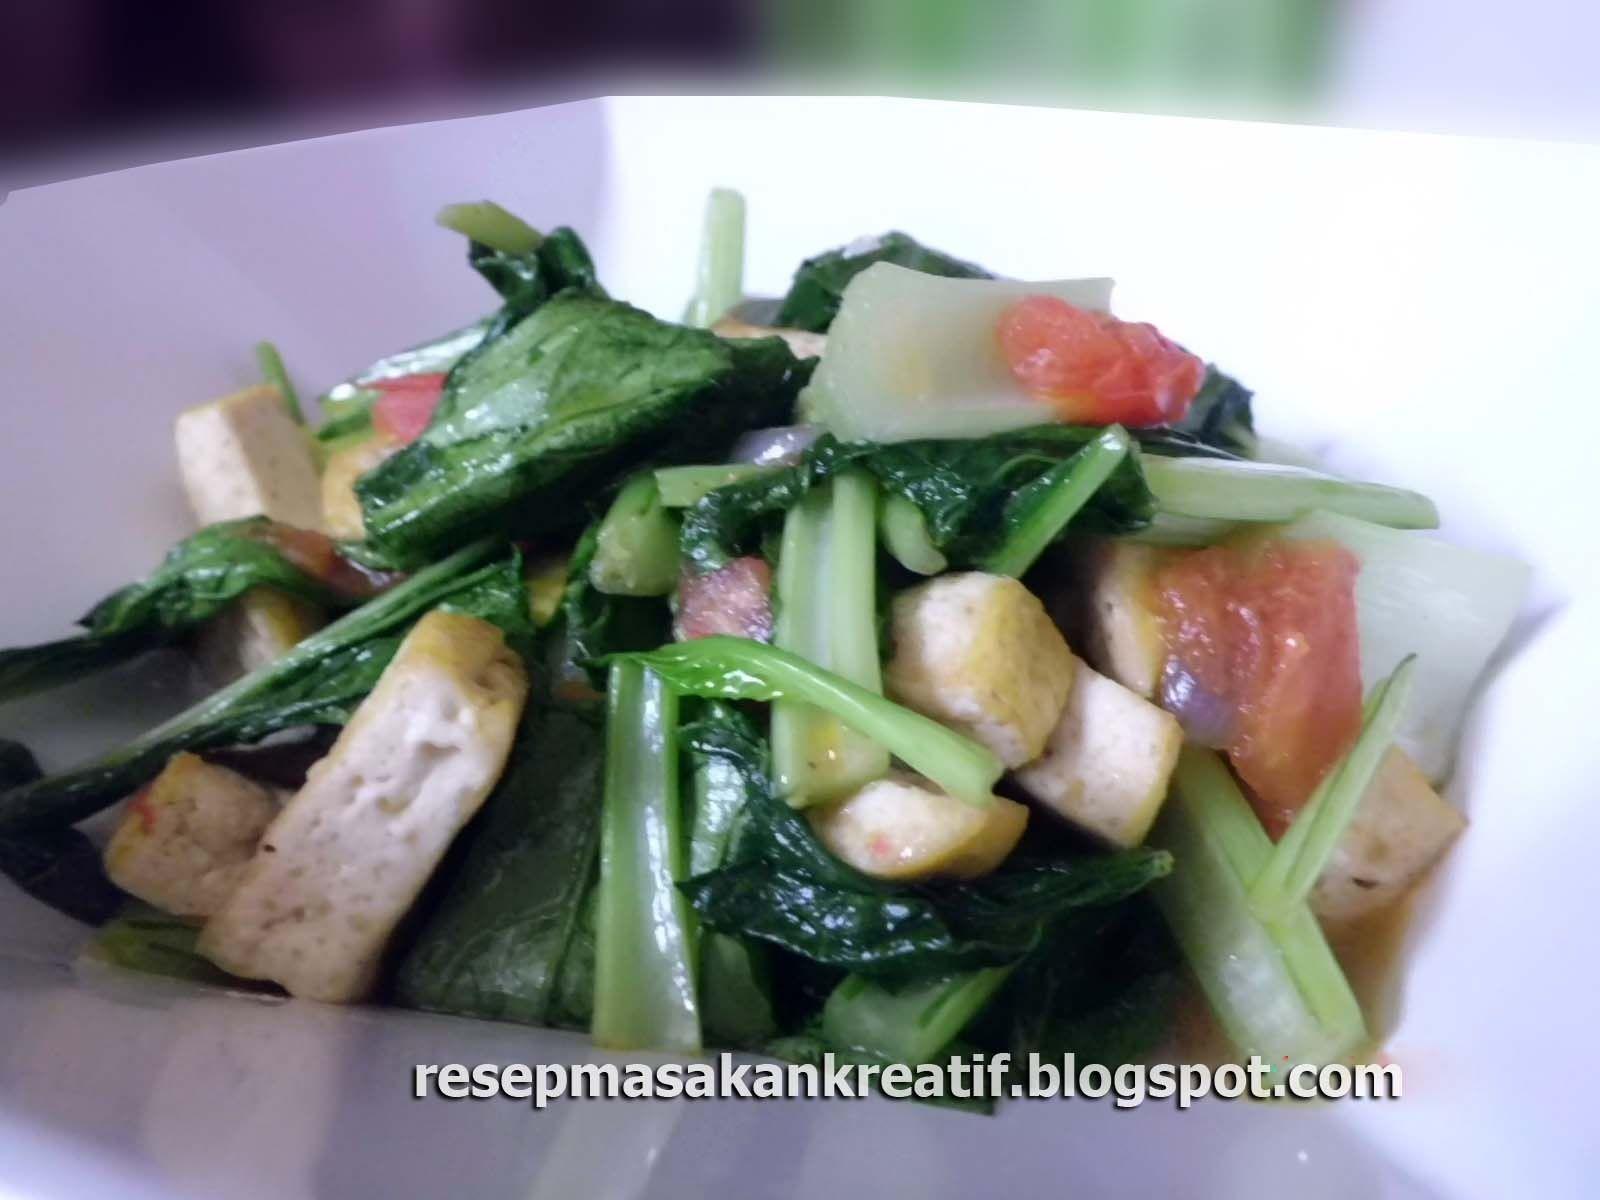 Resep Tumis Tahu Sawi Hijau Resep Resep Masakan Resep Masakan Indonesia